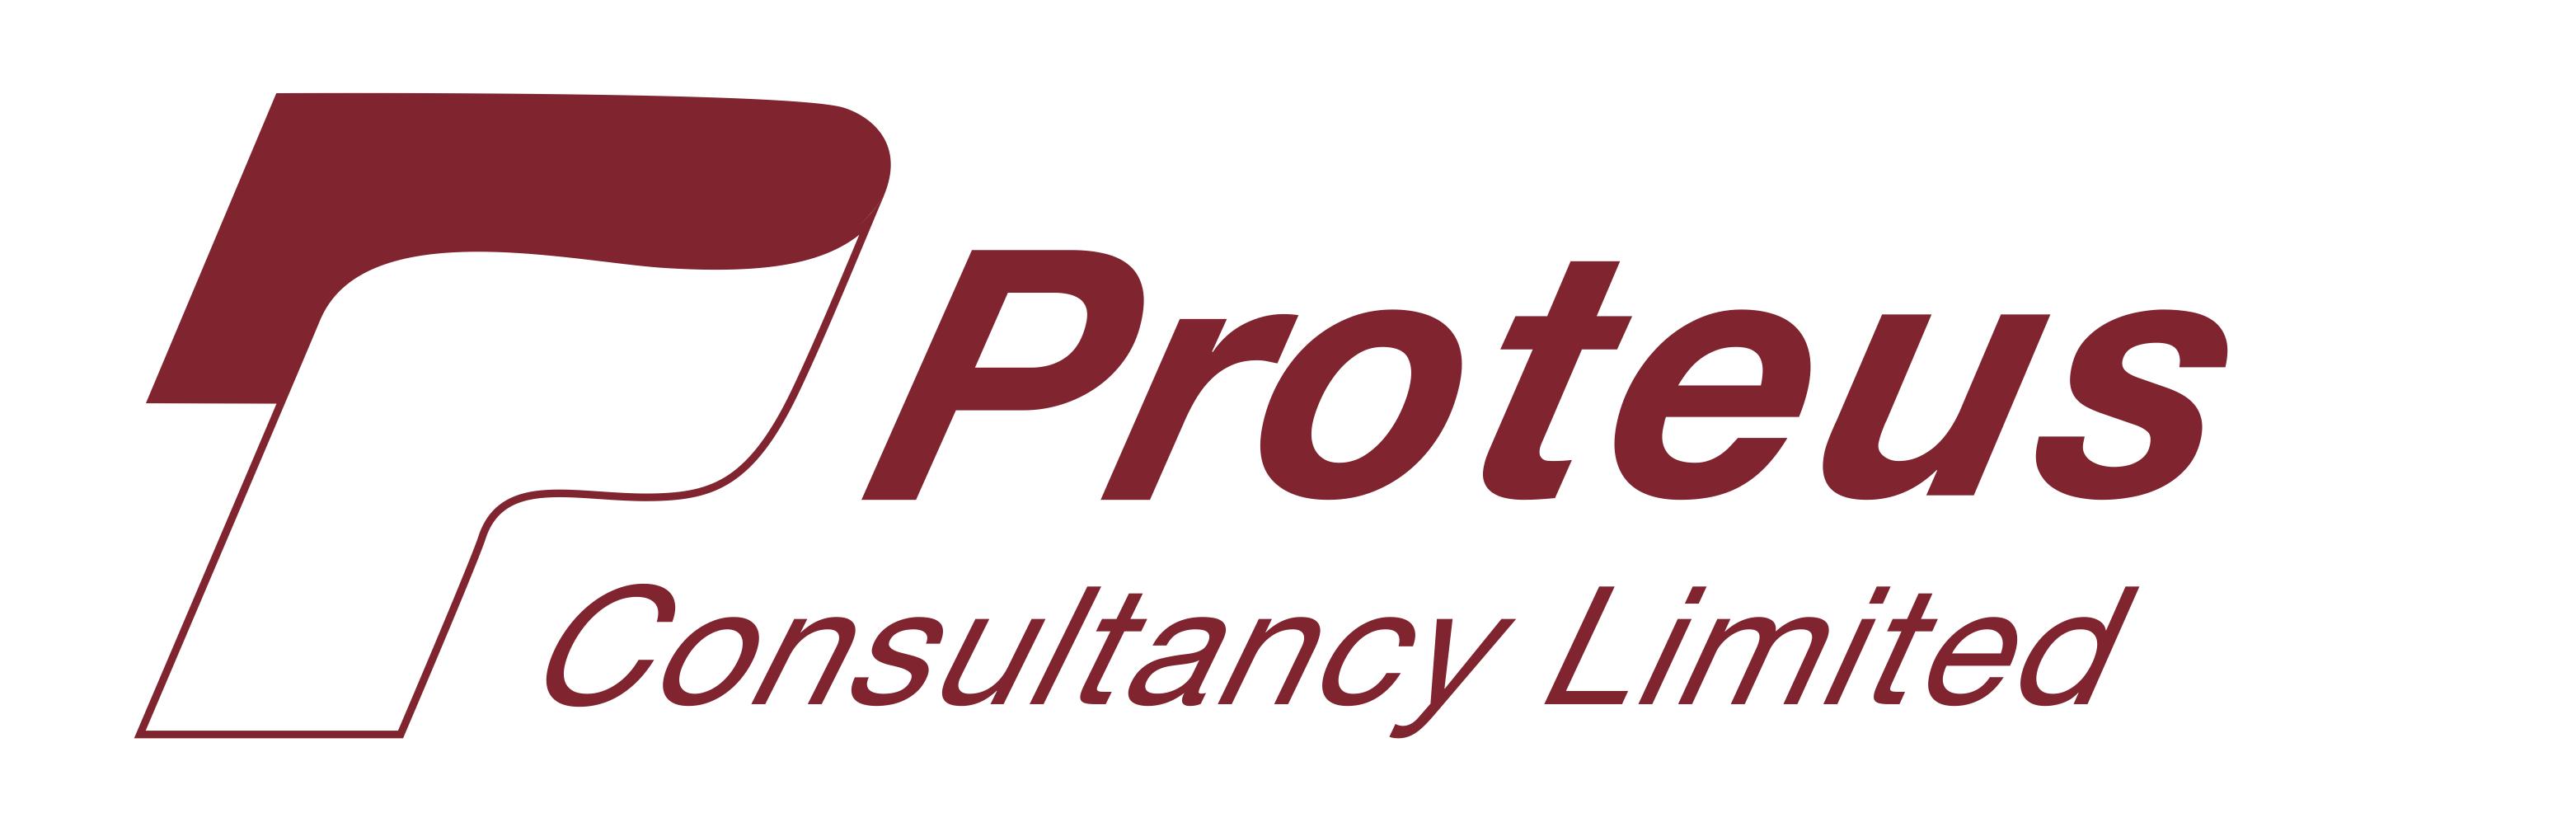 You and Proteus | Protecting your livelihood